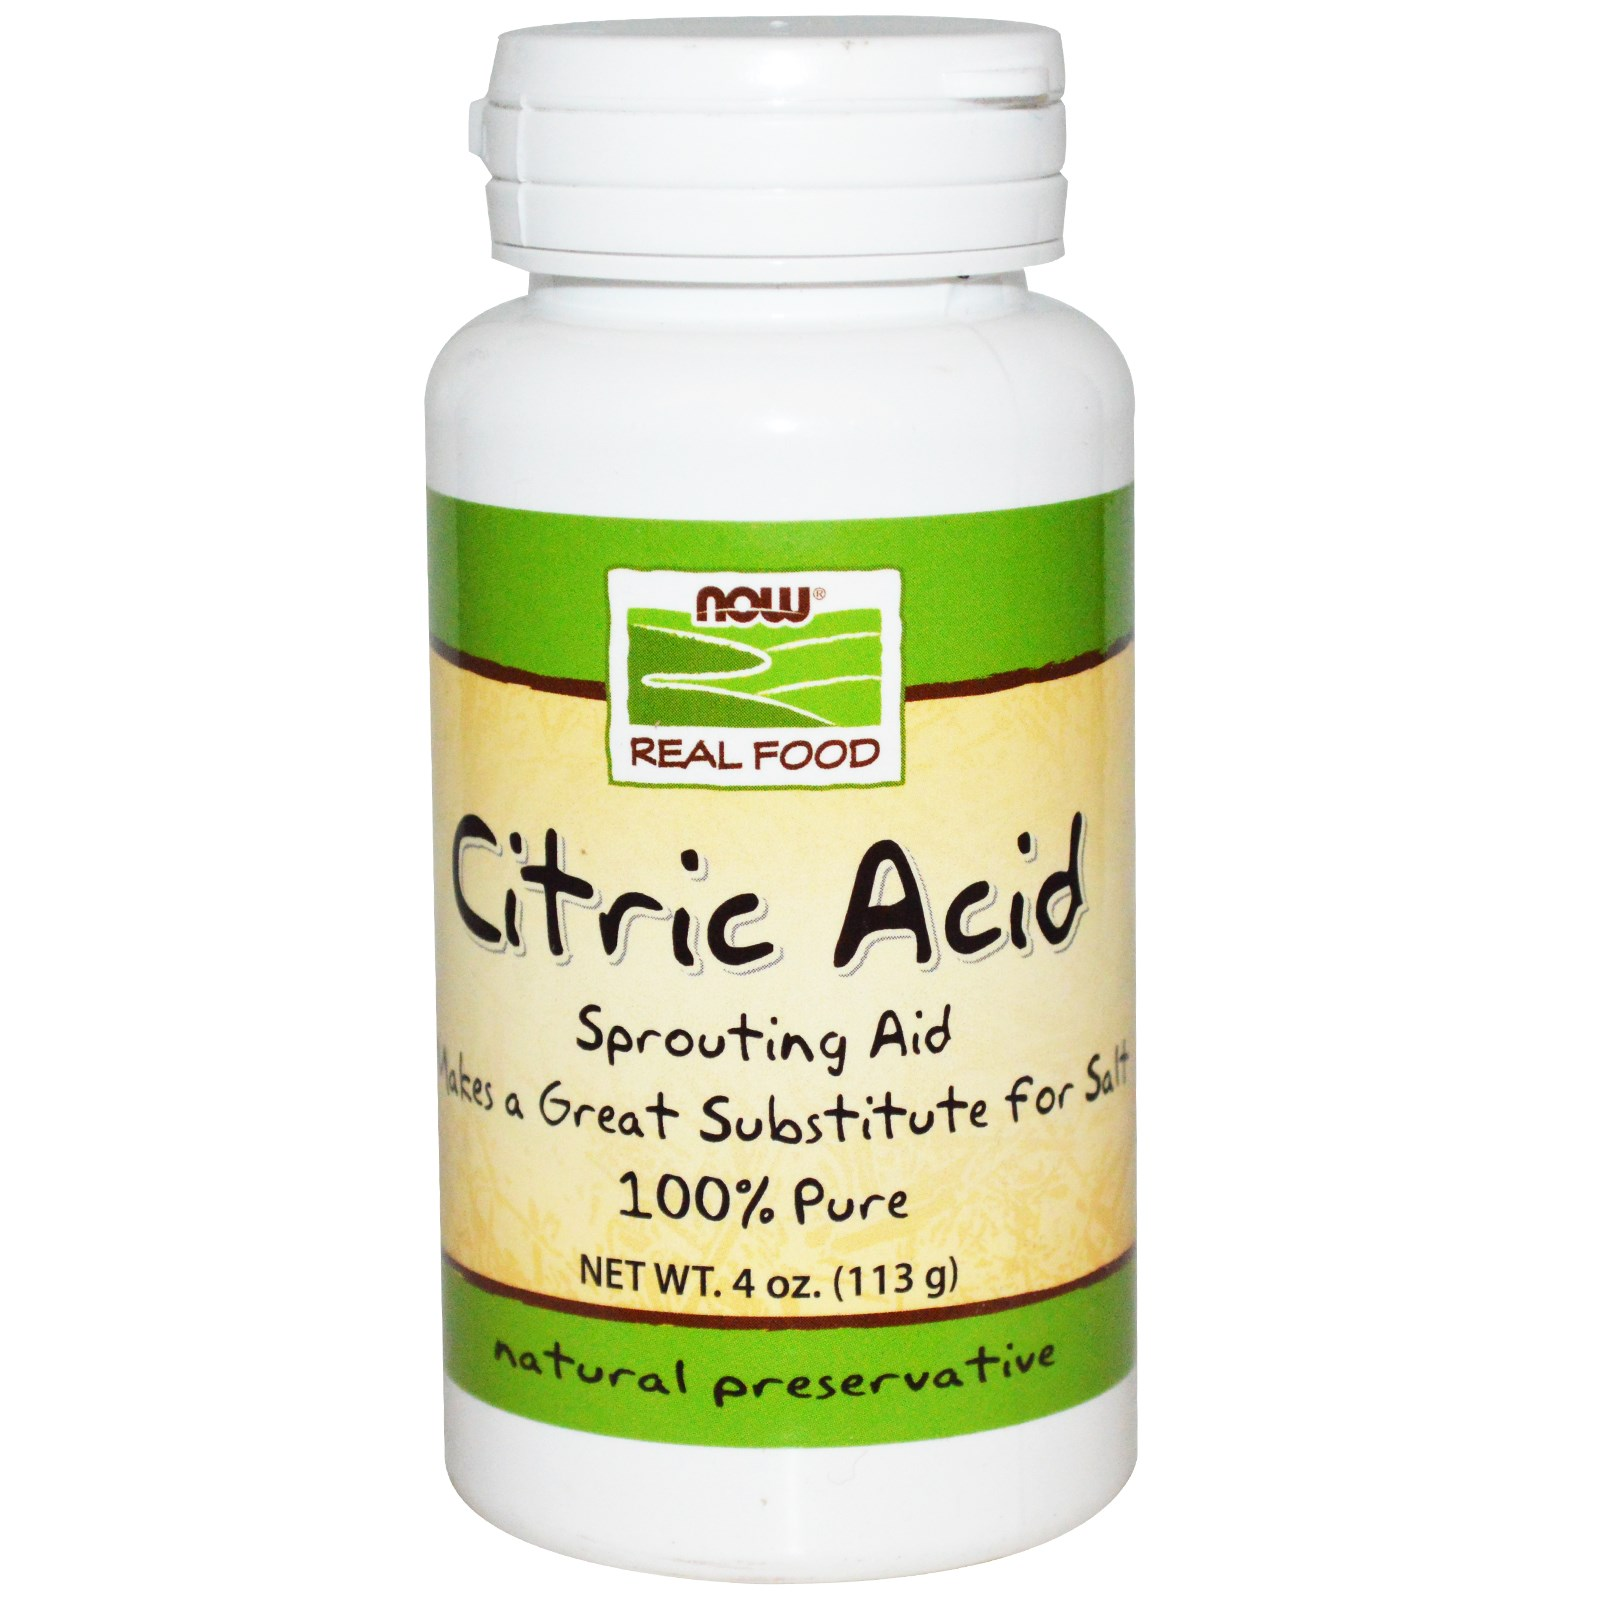 BRAND NEW Now Foods, Citric Acid, 4 oz (113 g), Health